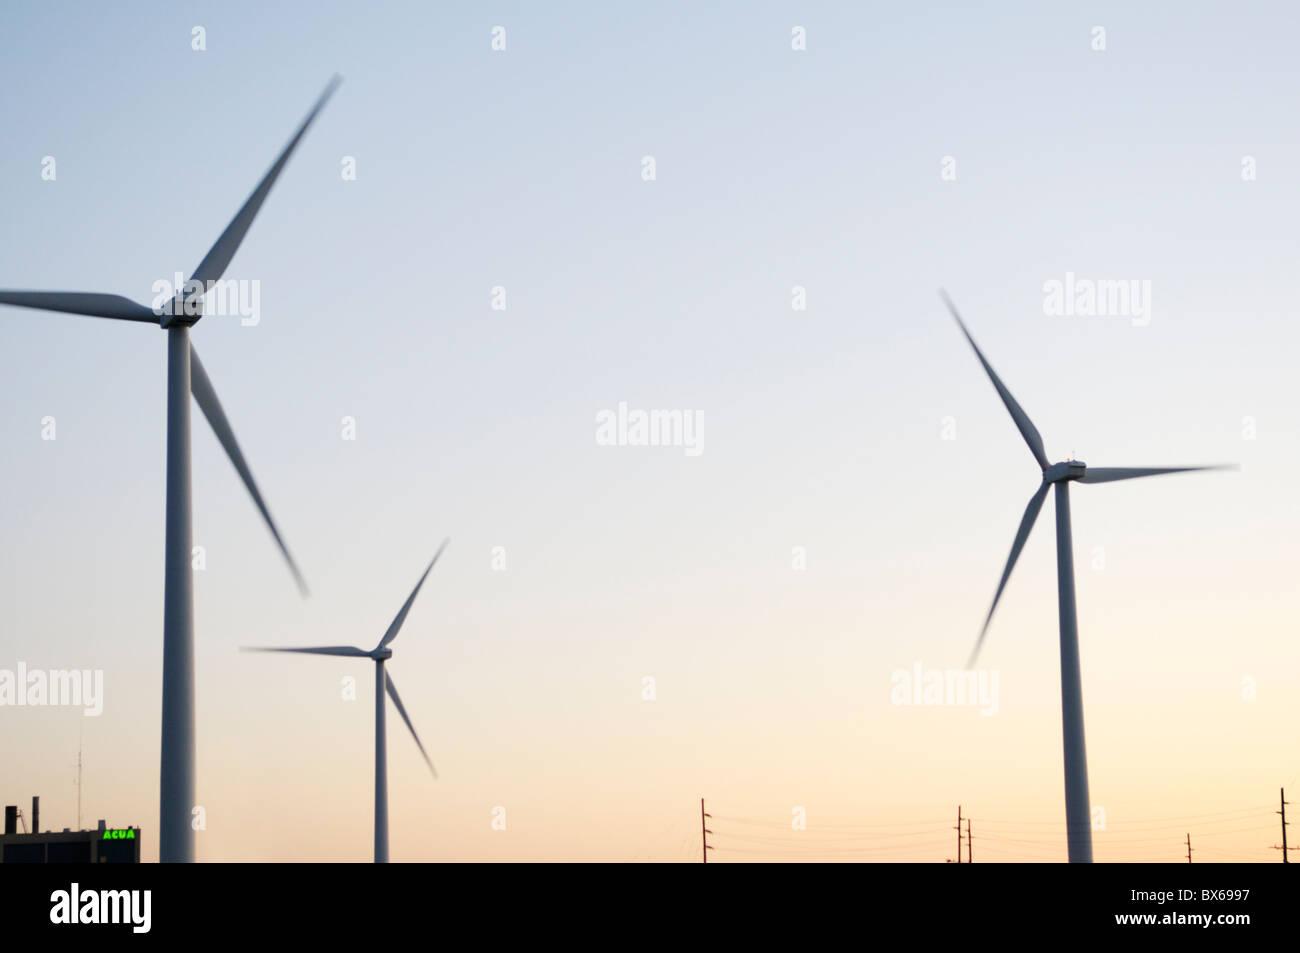 Wind Farm, Atlantic County Utilities Authority, Atlantic City, New Jersey - Stock Image